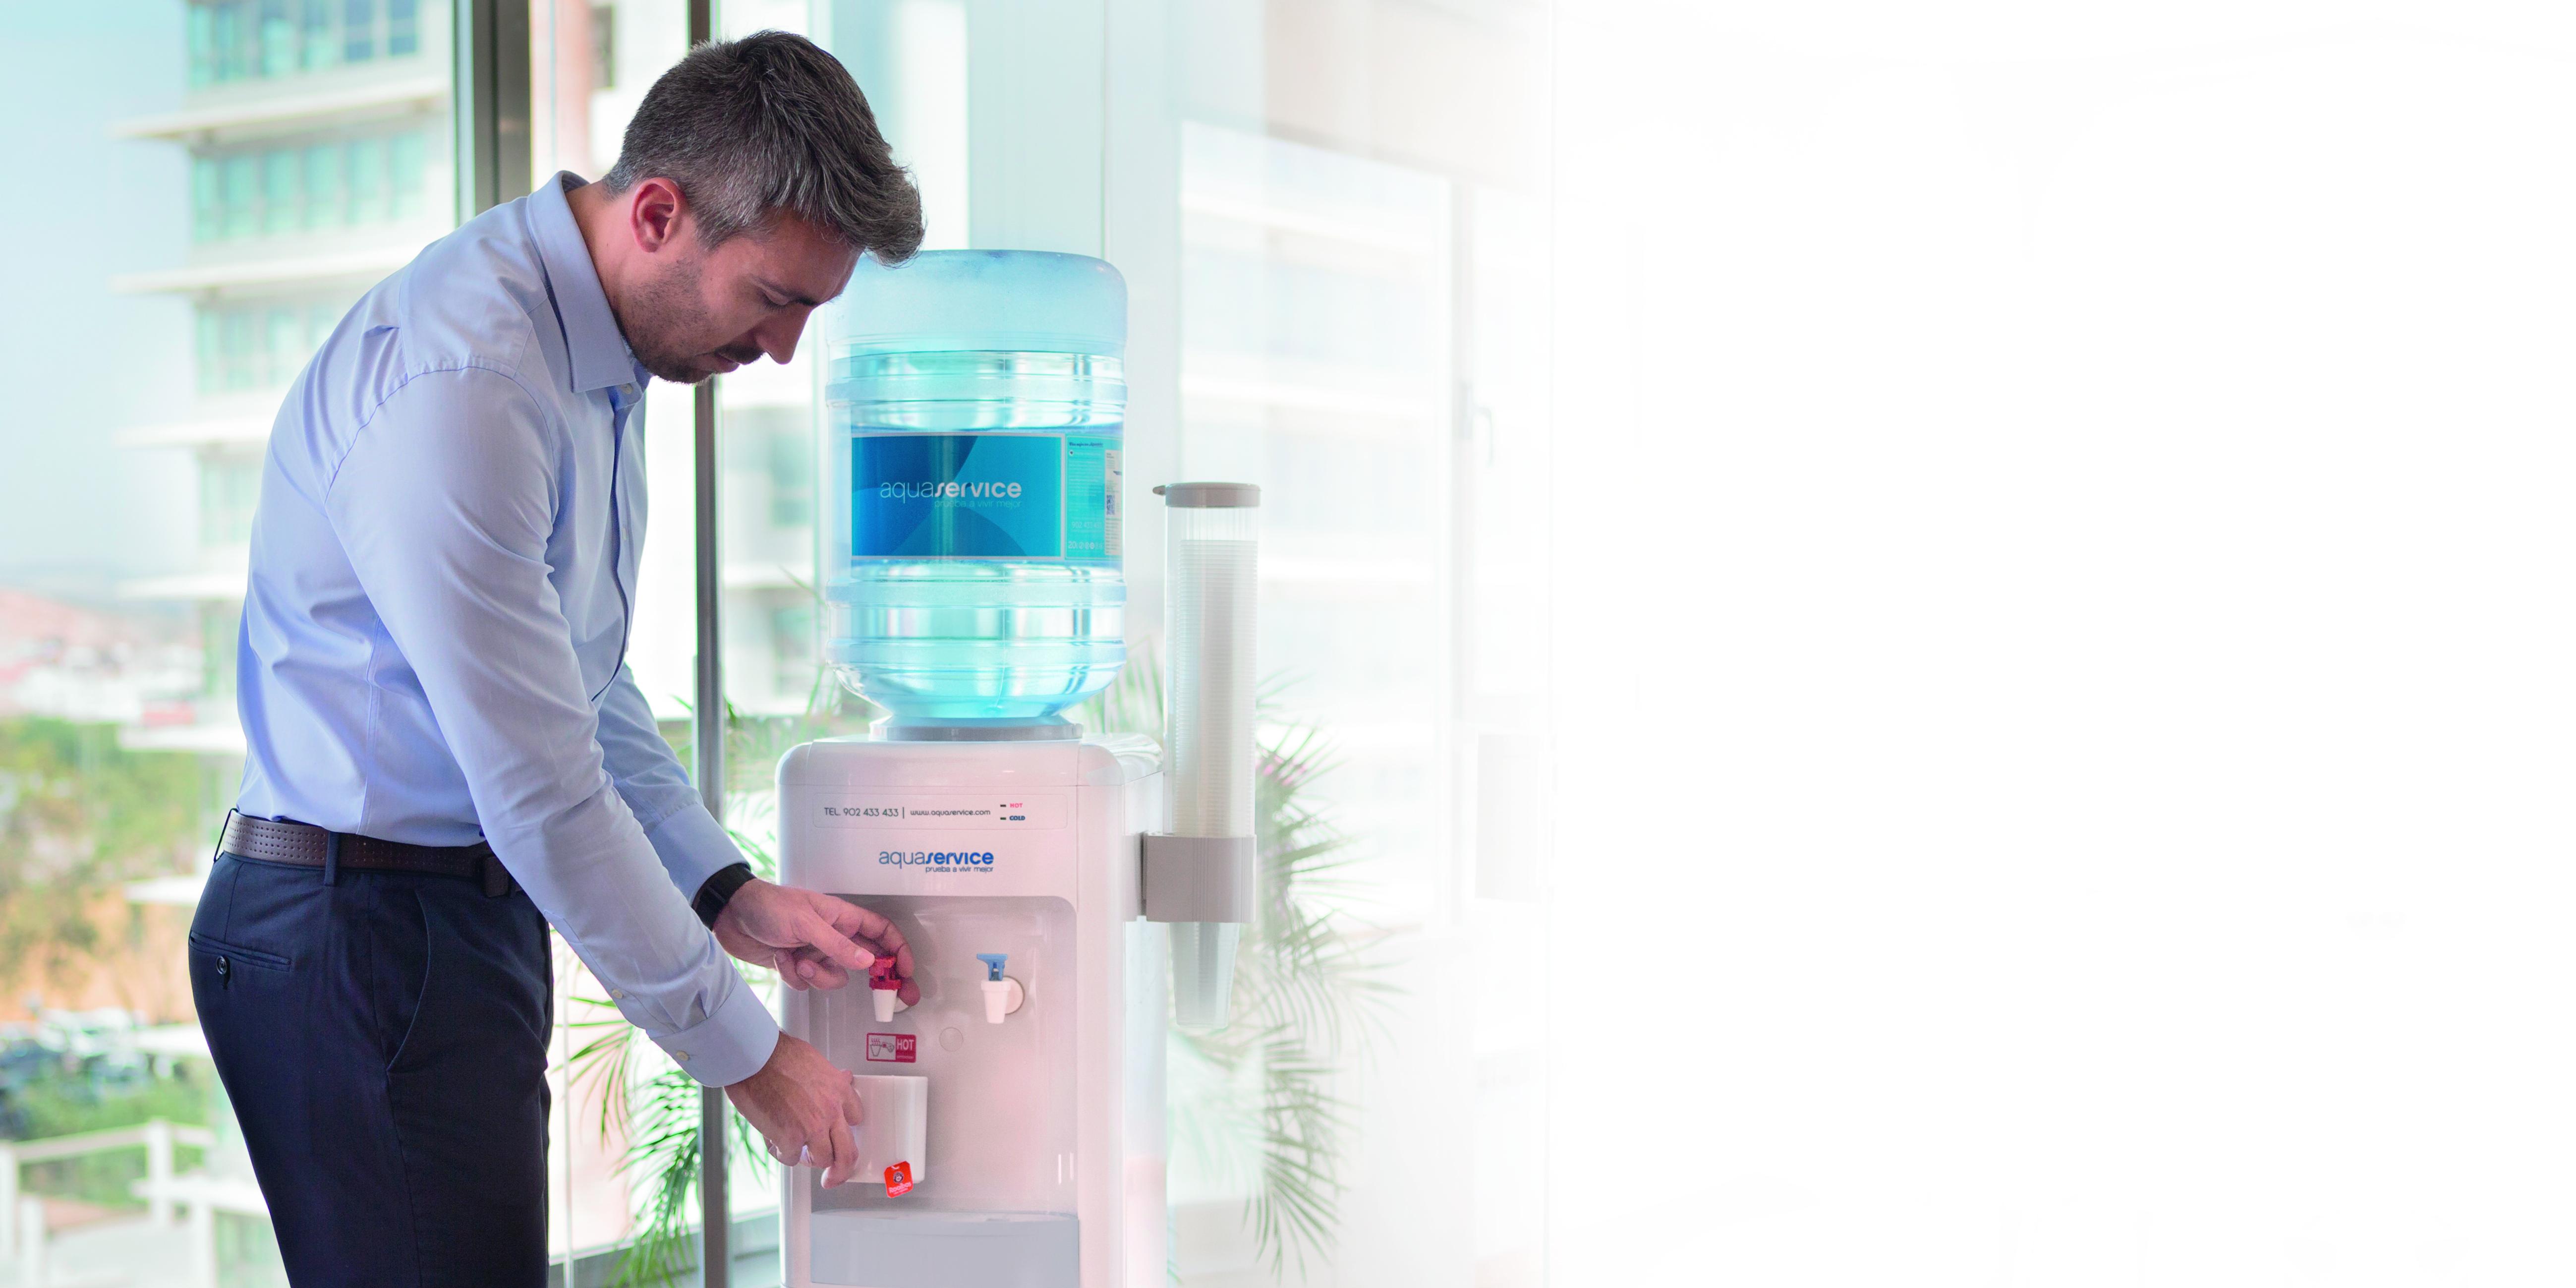 agua para oficinas combina tu dispensador con tus botellines